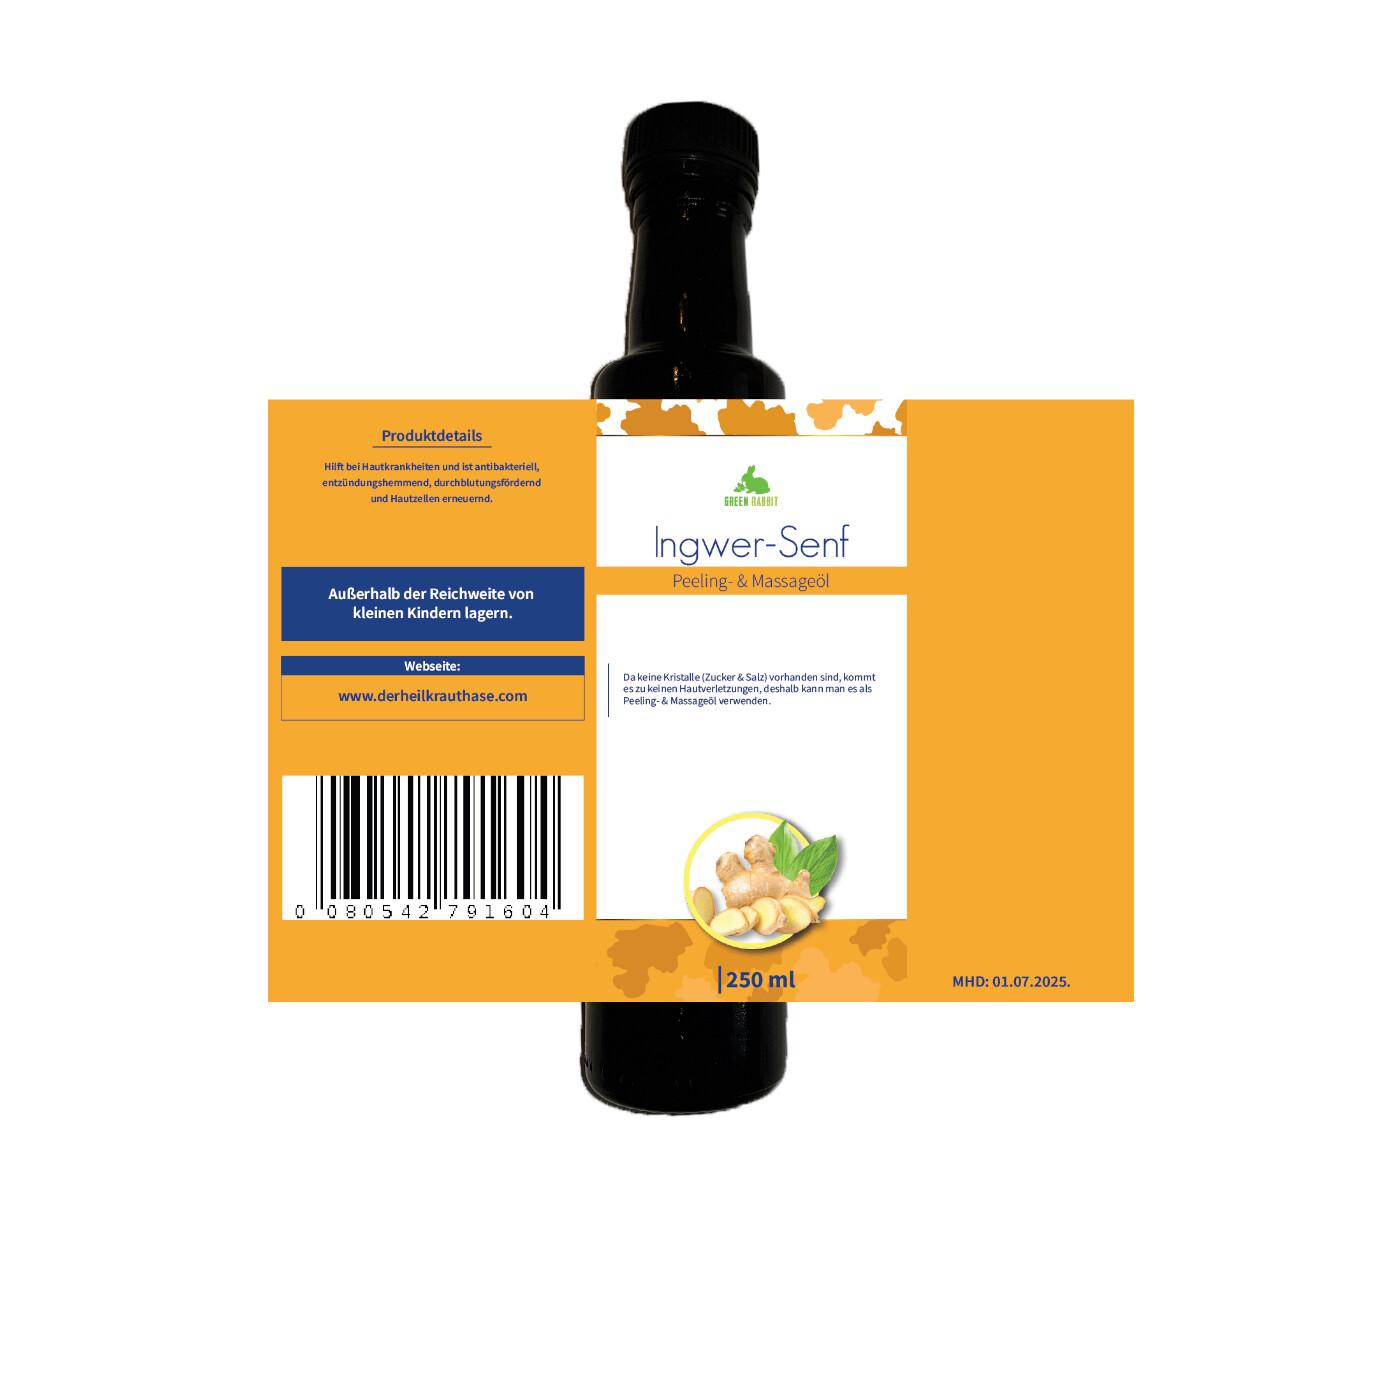 Veganes Ingwer - Senf Öl